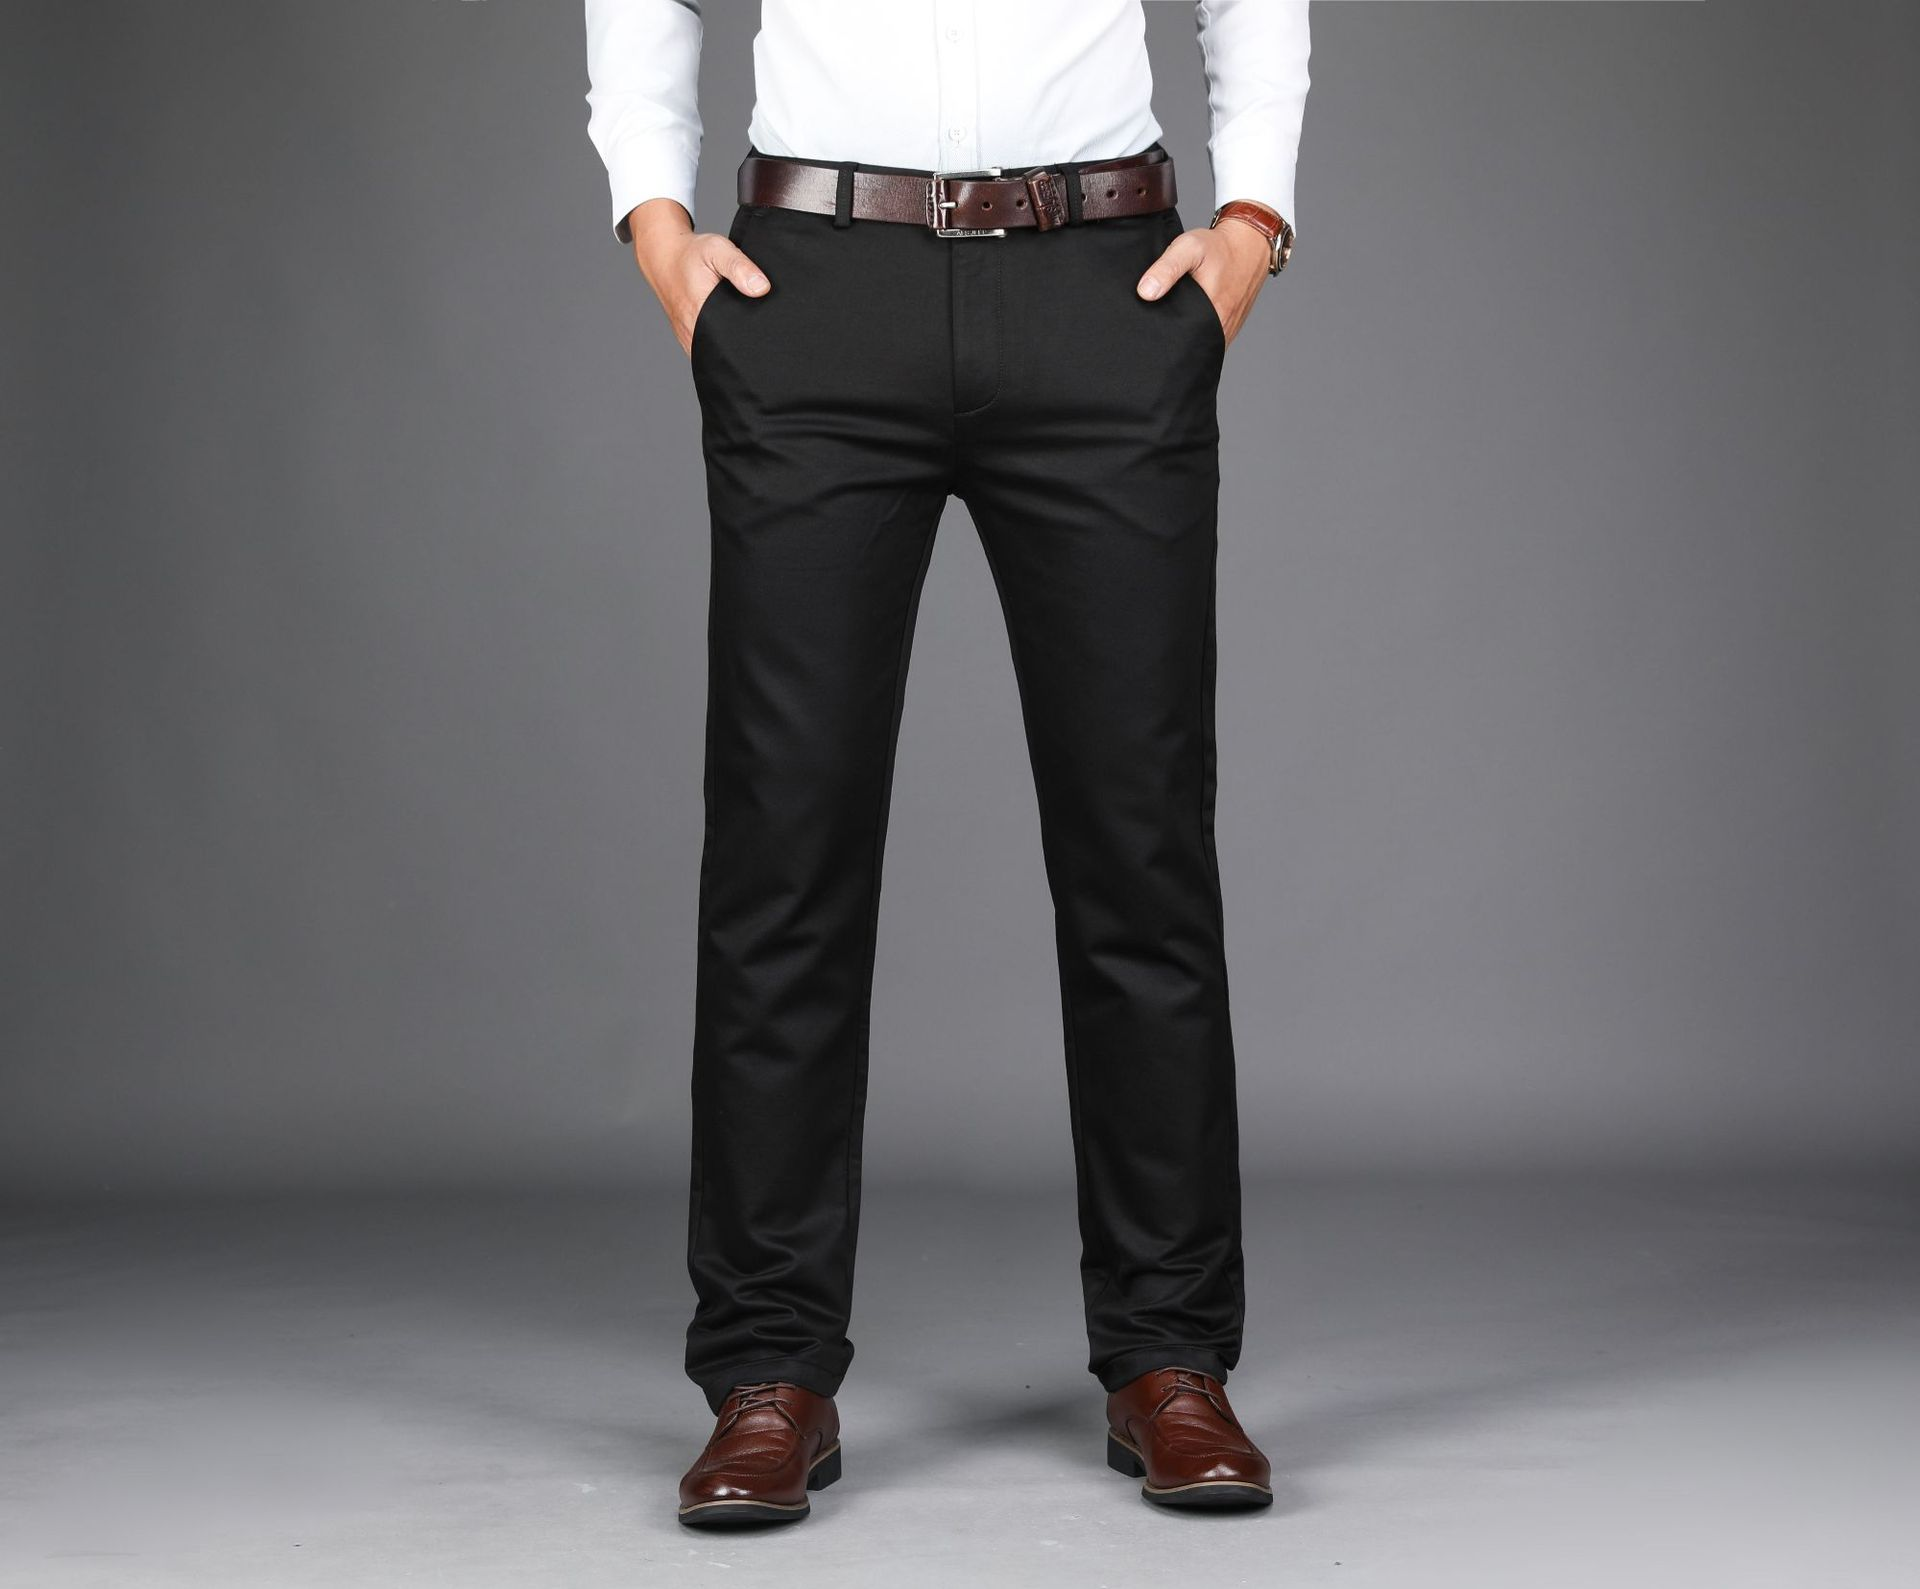 2018 New Style Men Autumn & Winter MEN'S Casual Pants Long Pants Men Urban Fashion Business Casual Long Pants